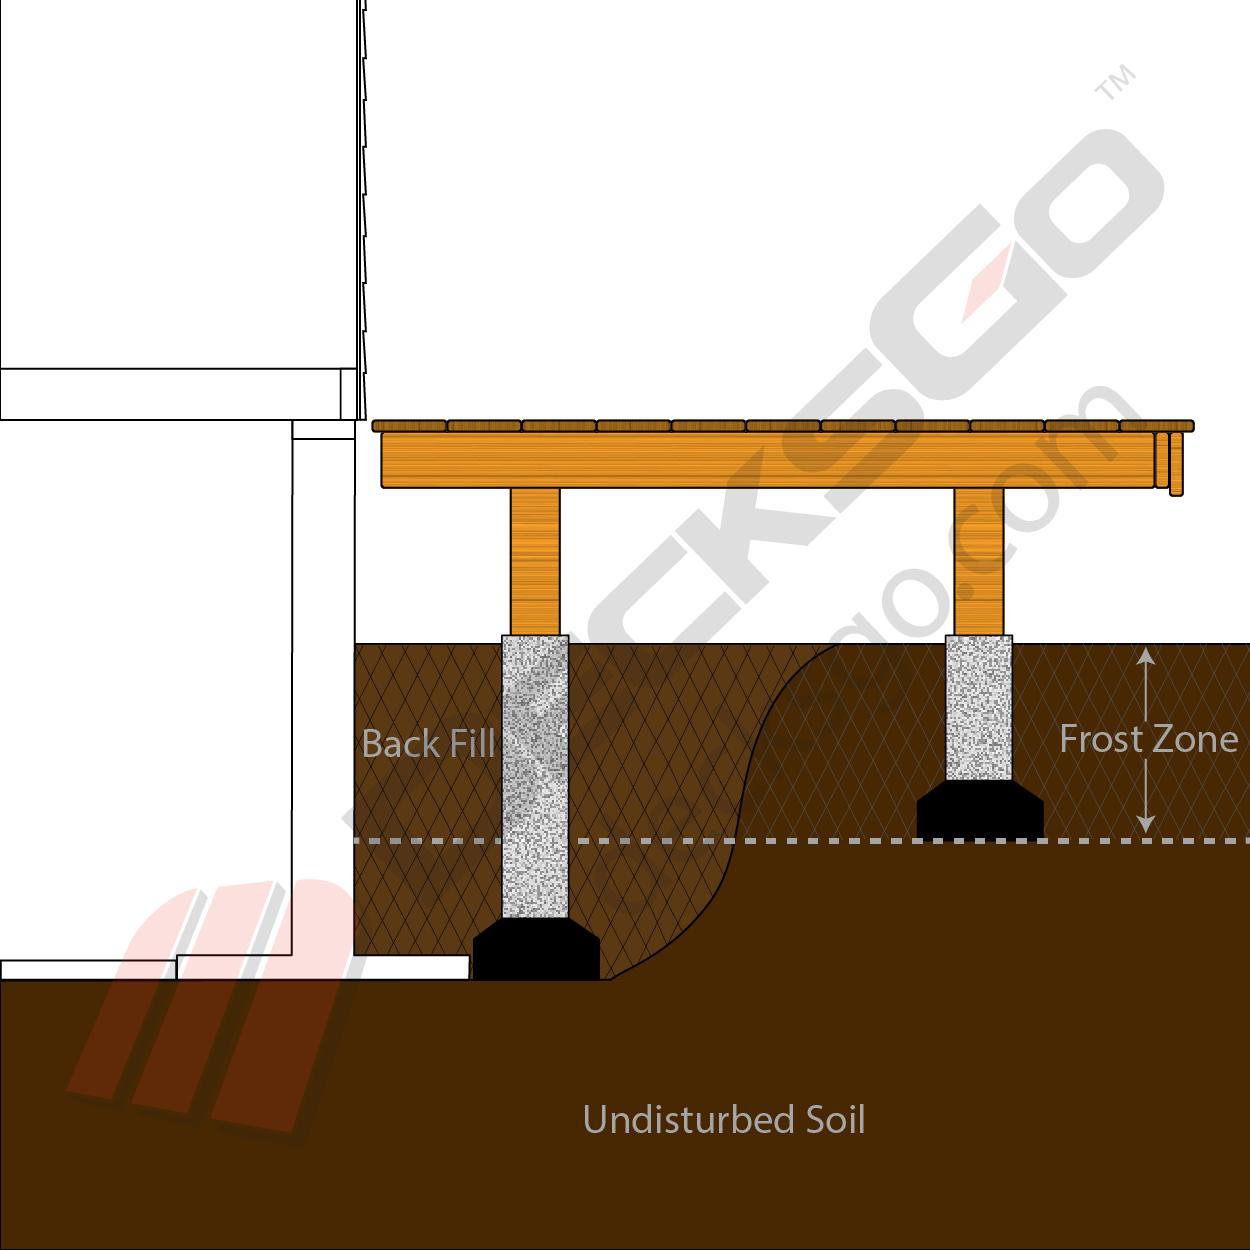 Footings set on undisturbed soil near foundation wall